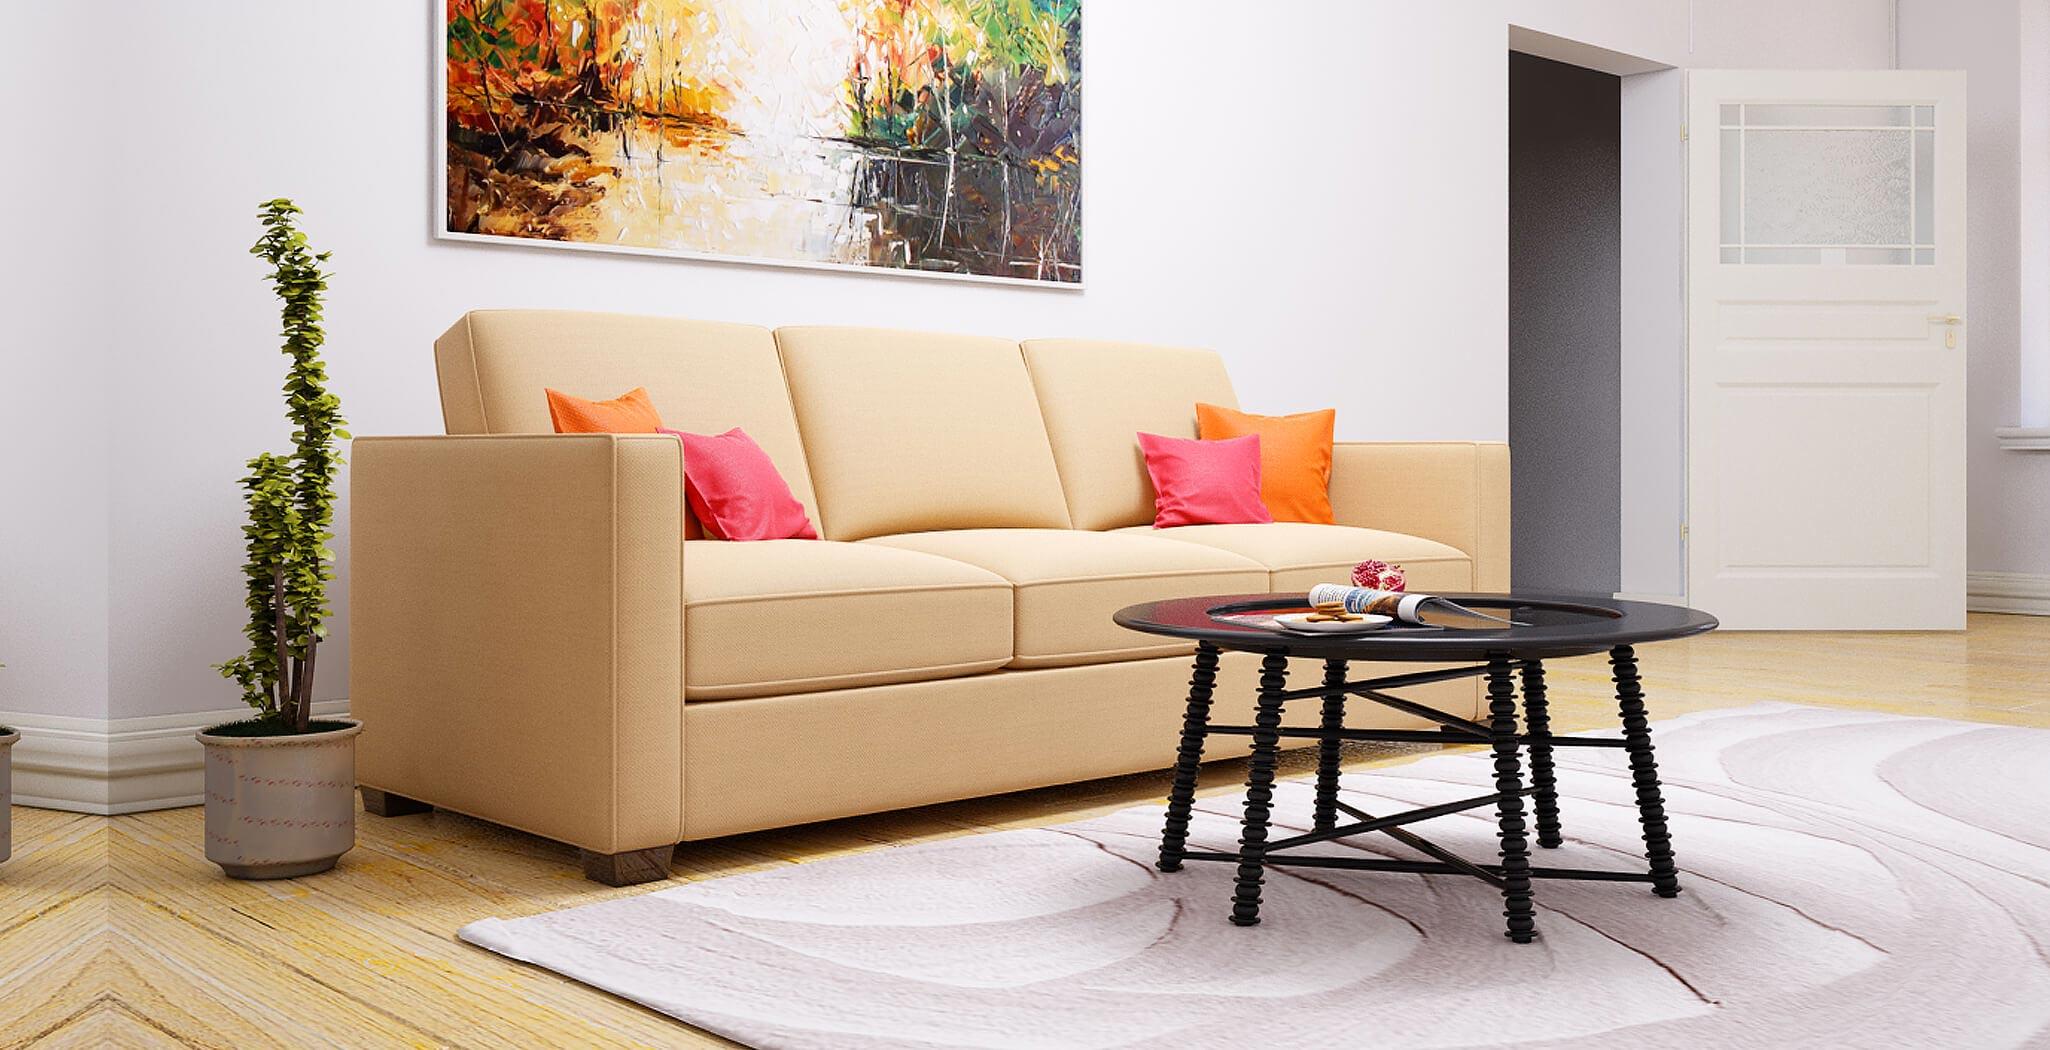 calgary sofa furniture gallery 4